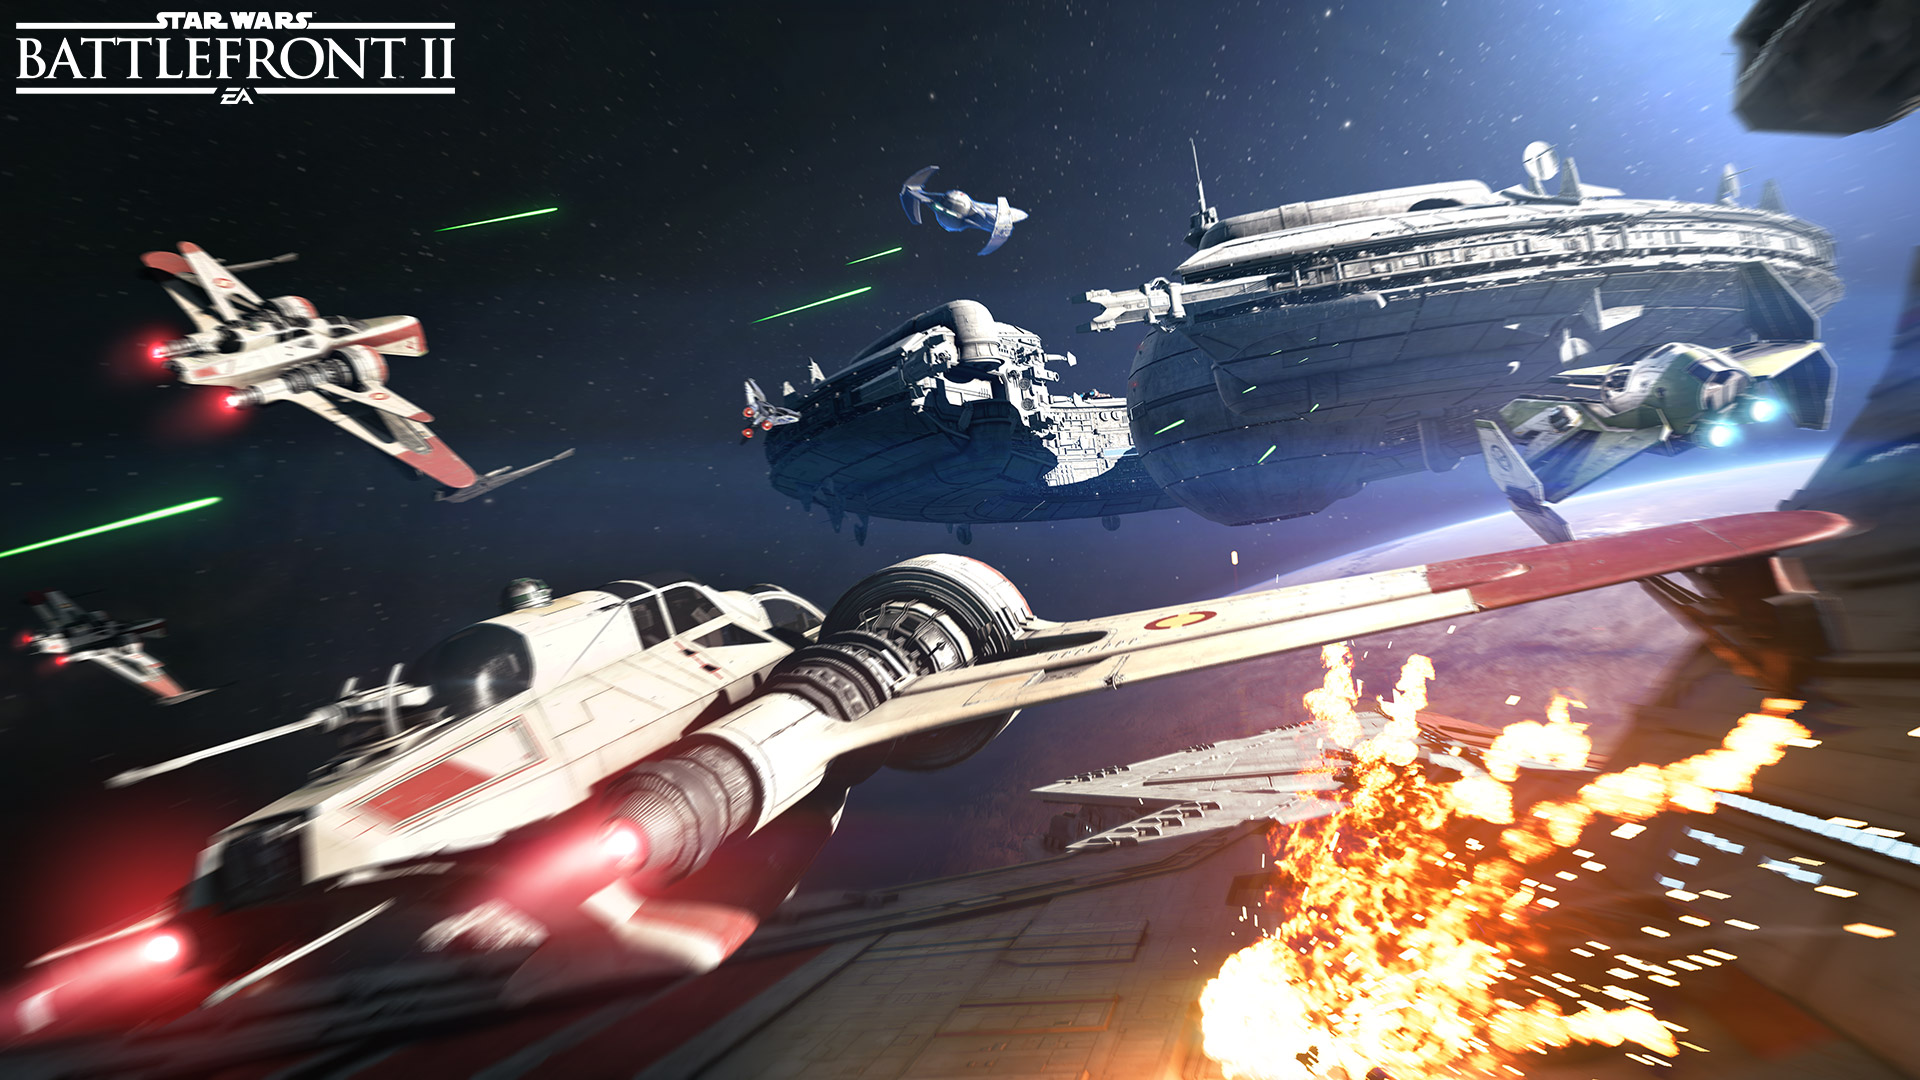 Star Wars Battlefront 2 background 12